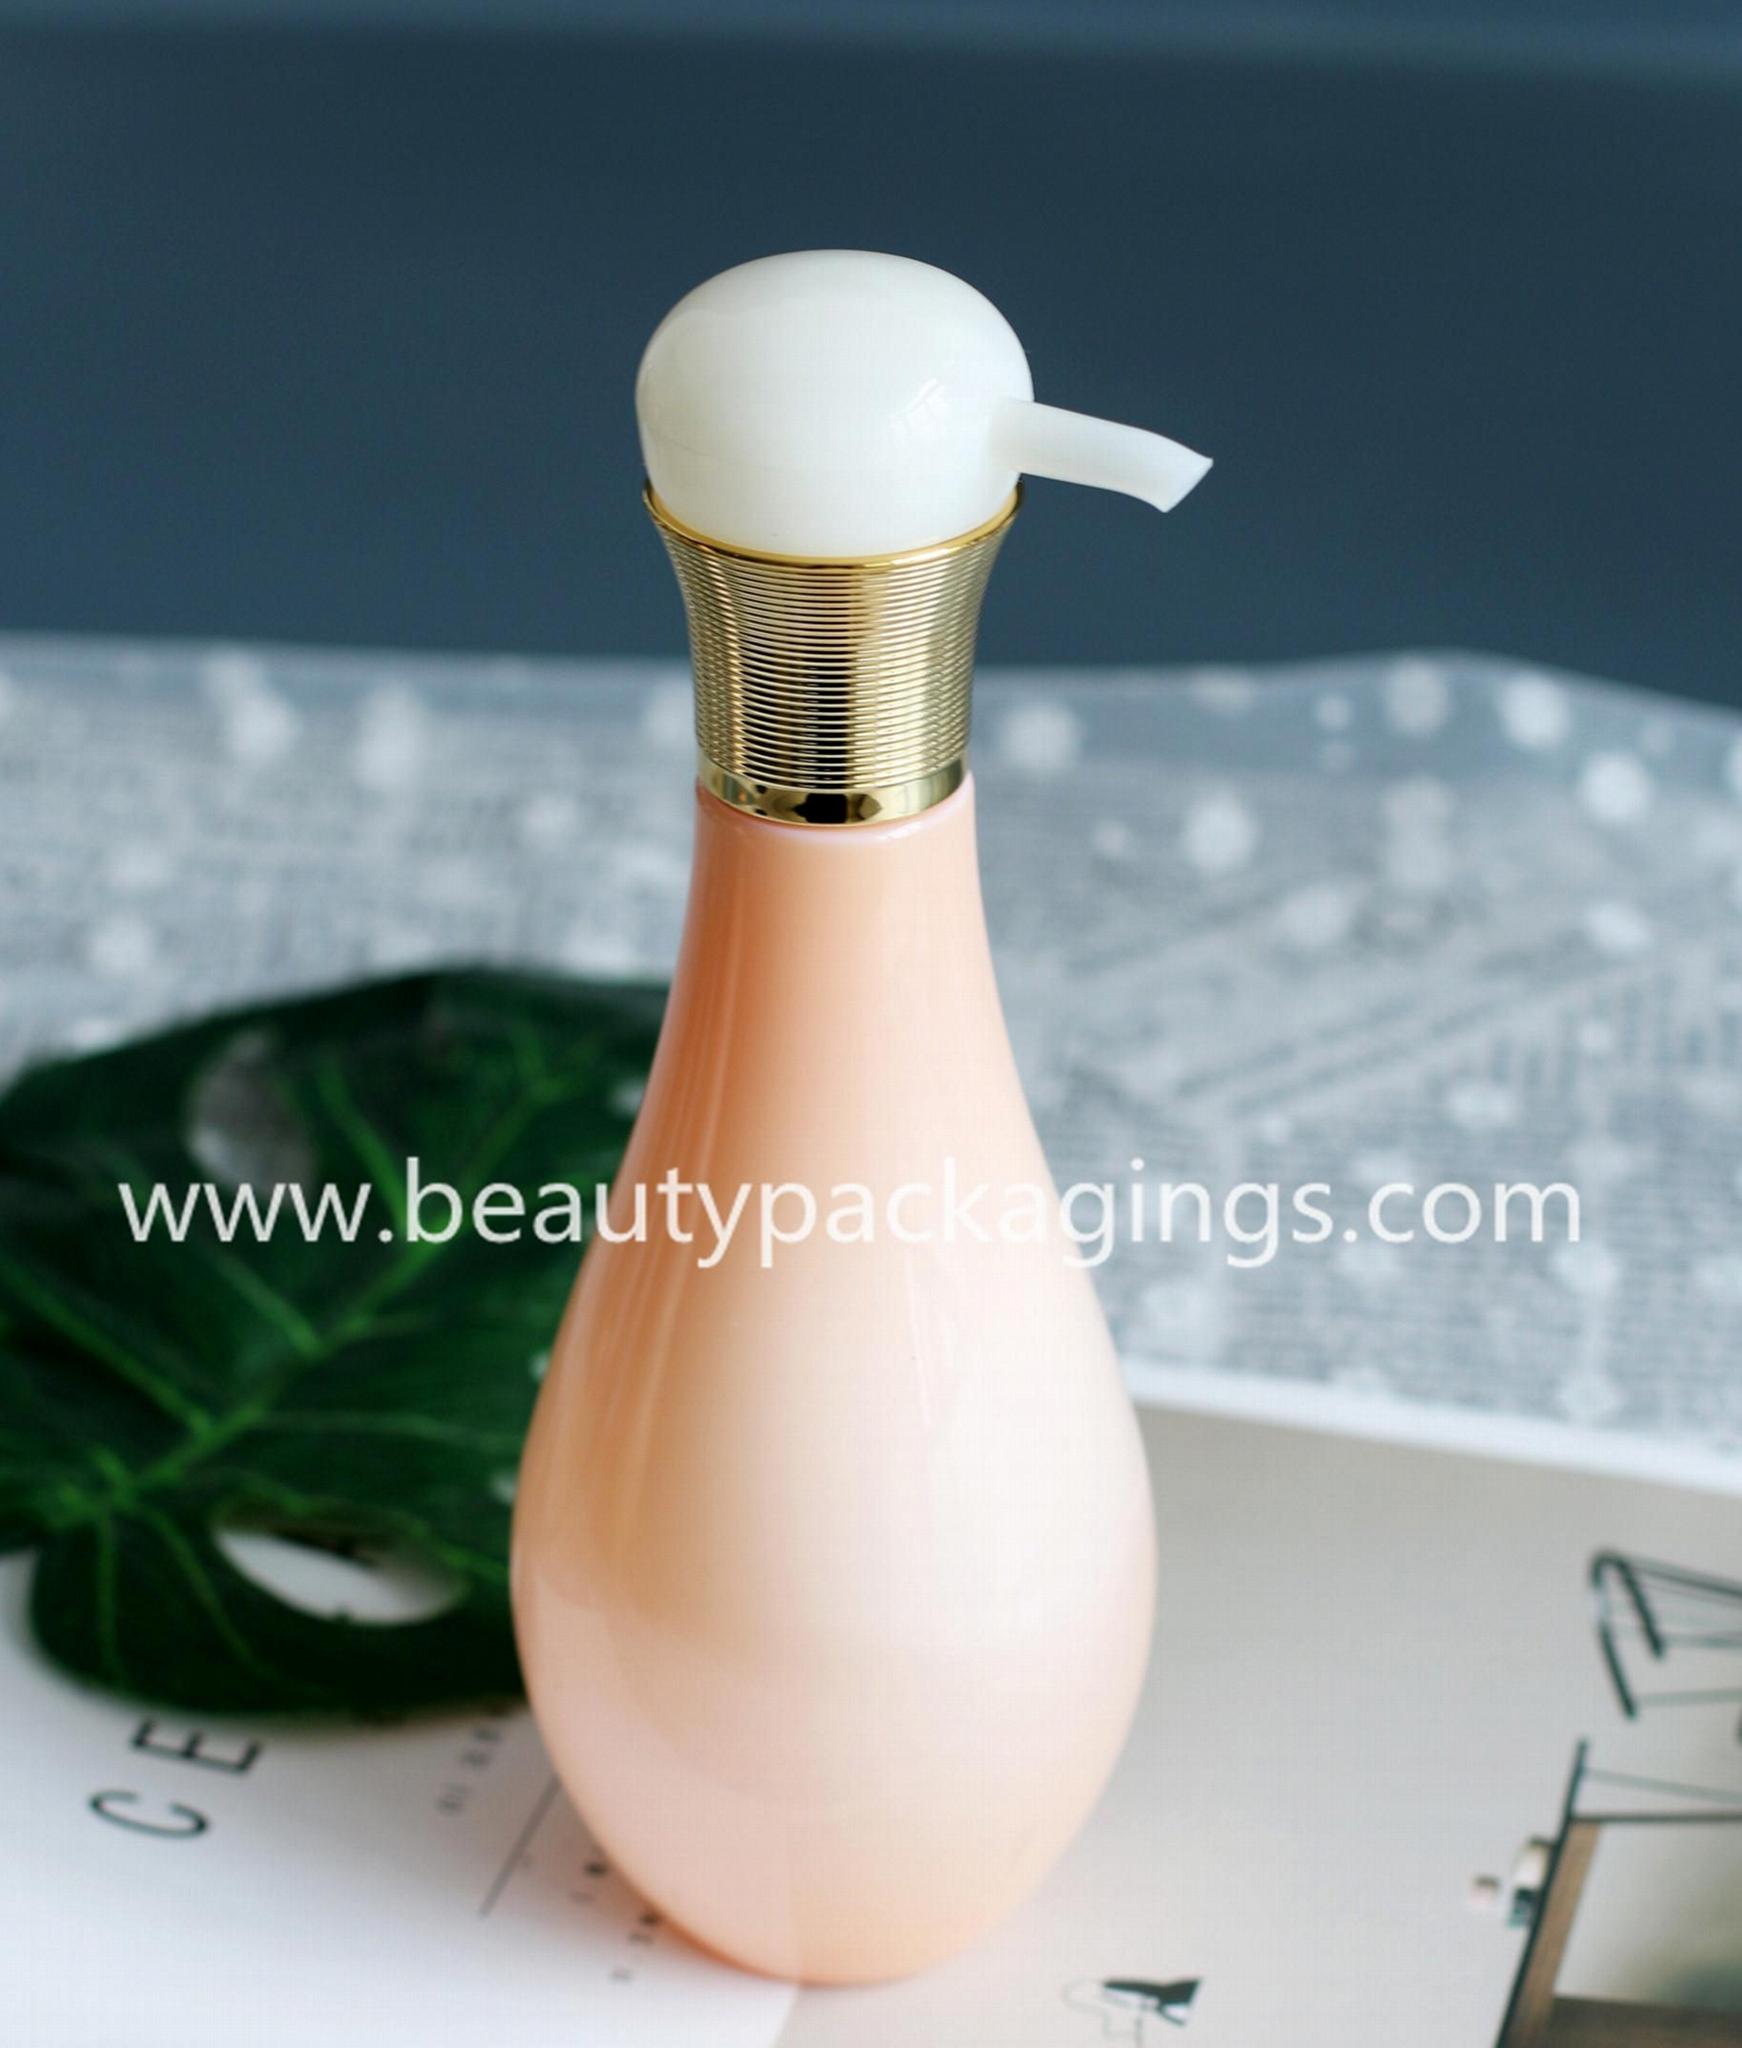 500ml Shinny Bulb Shape Plastic Shampoo Shower Gel Bottle 1